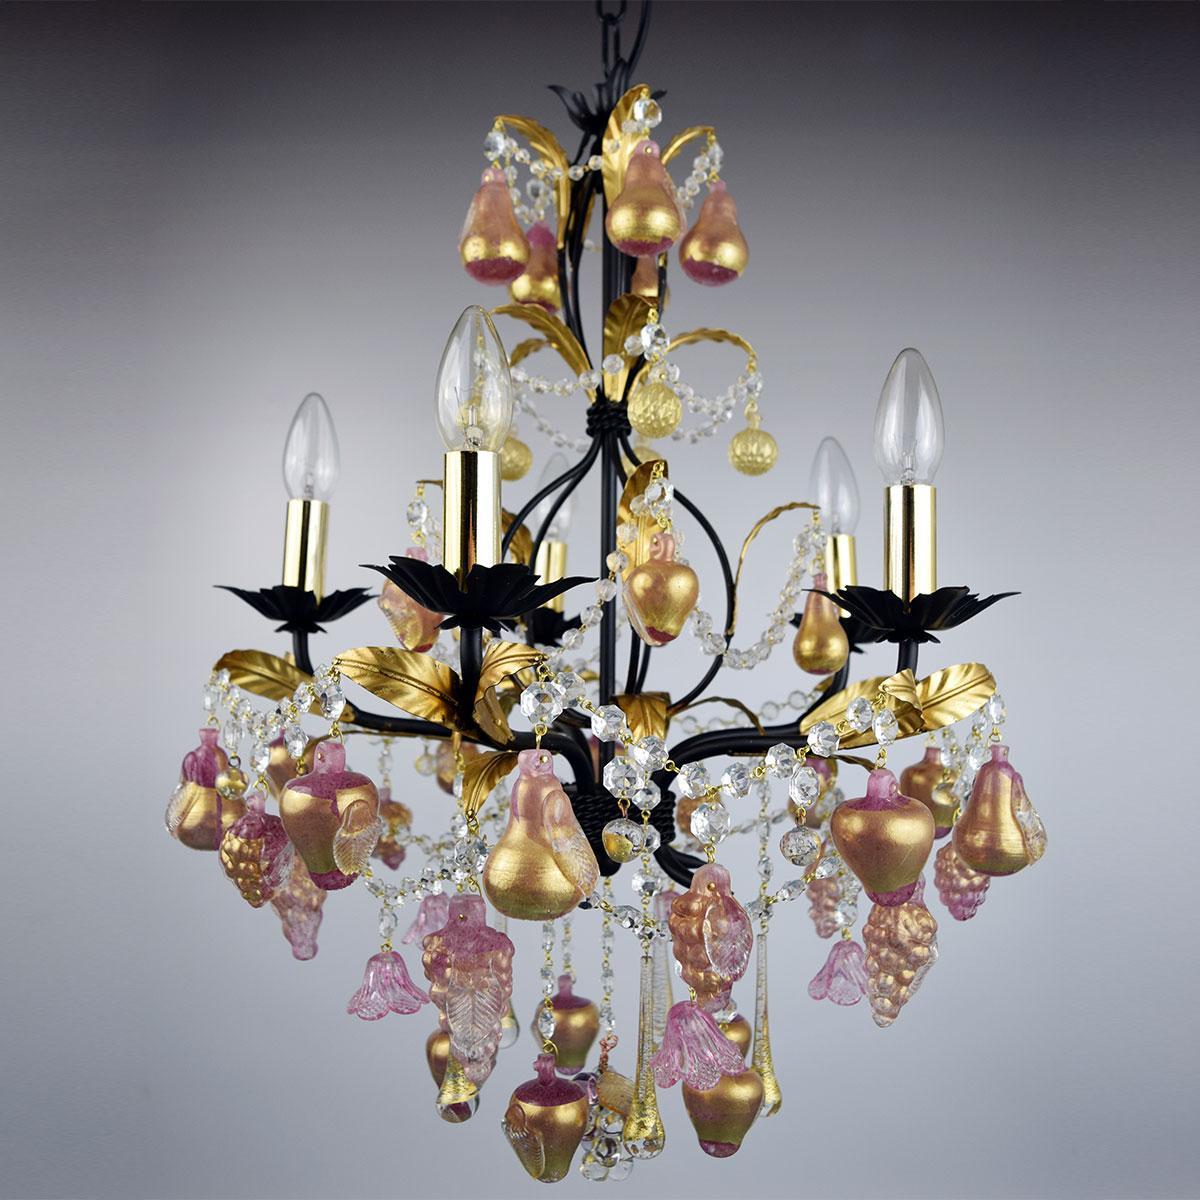 """Grappoli"" lustre en cristal de Murano  - 5 lumières - or"